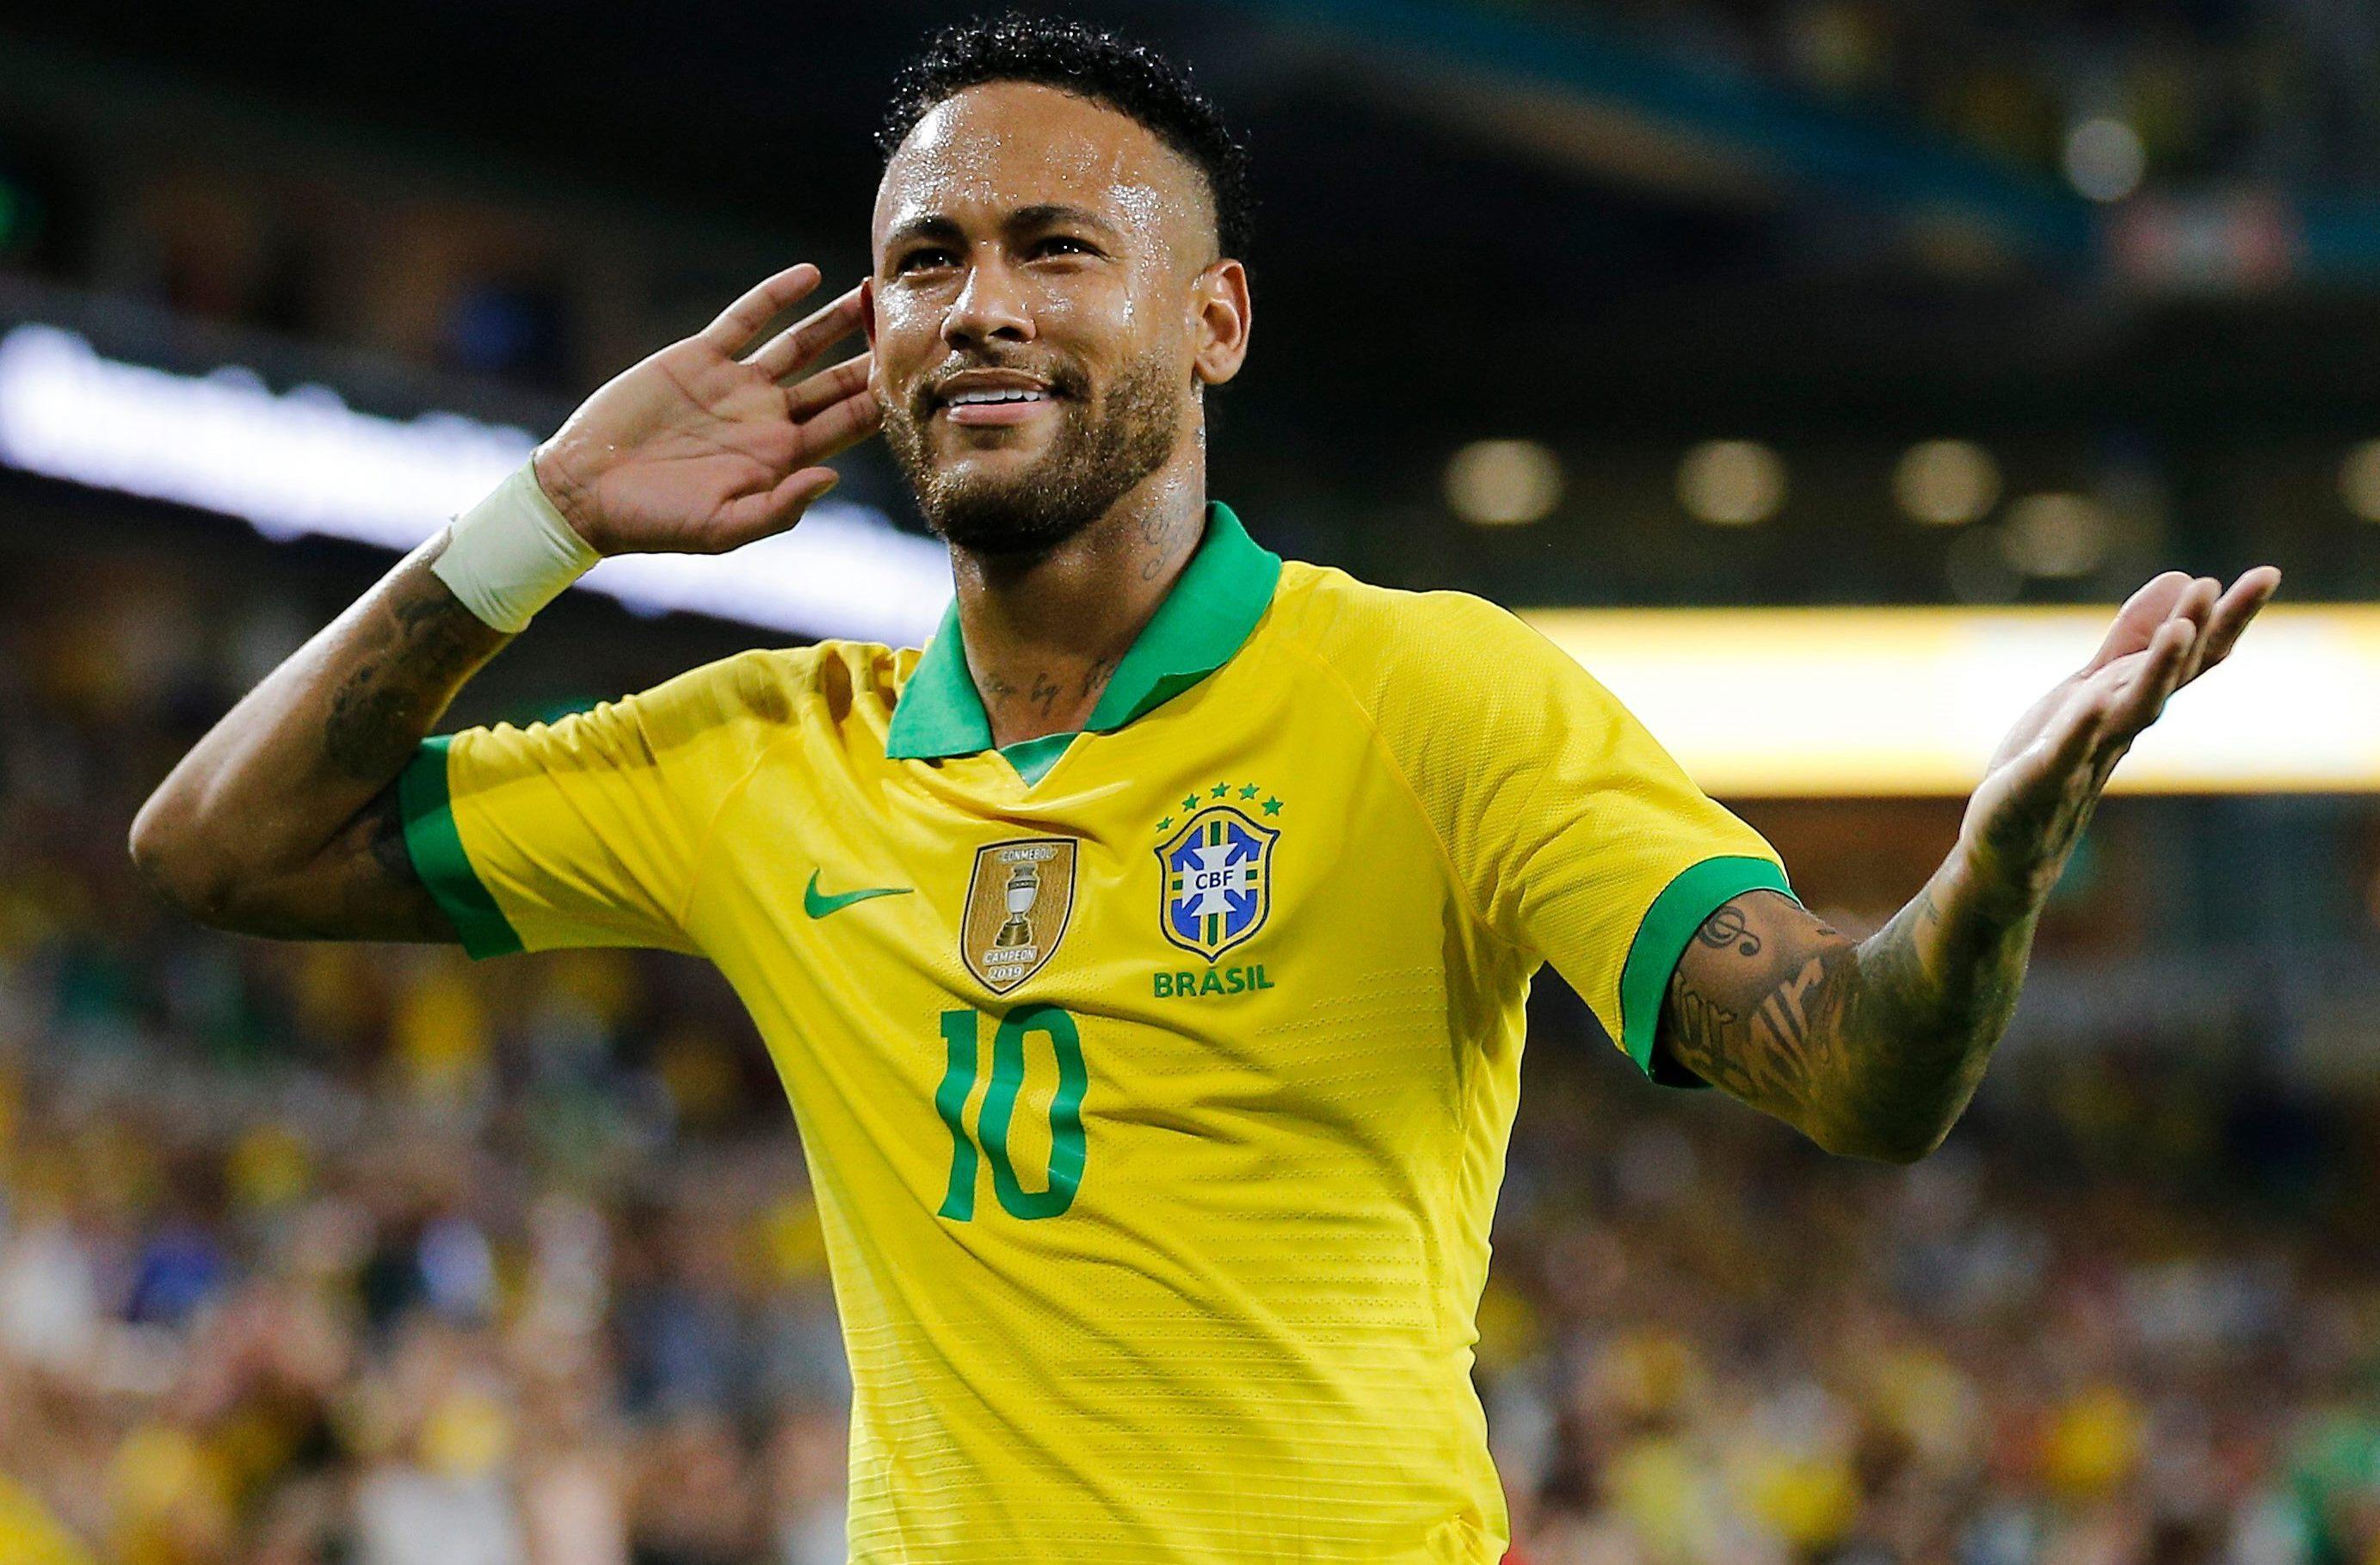 Brazil biljetter. Brazil 2018 19 ... 77049d578688a